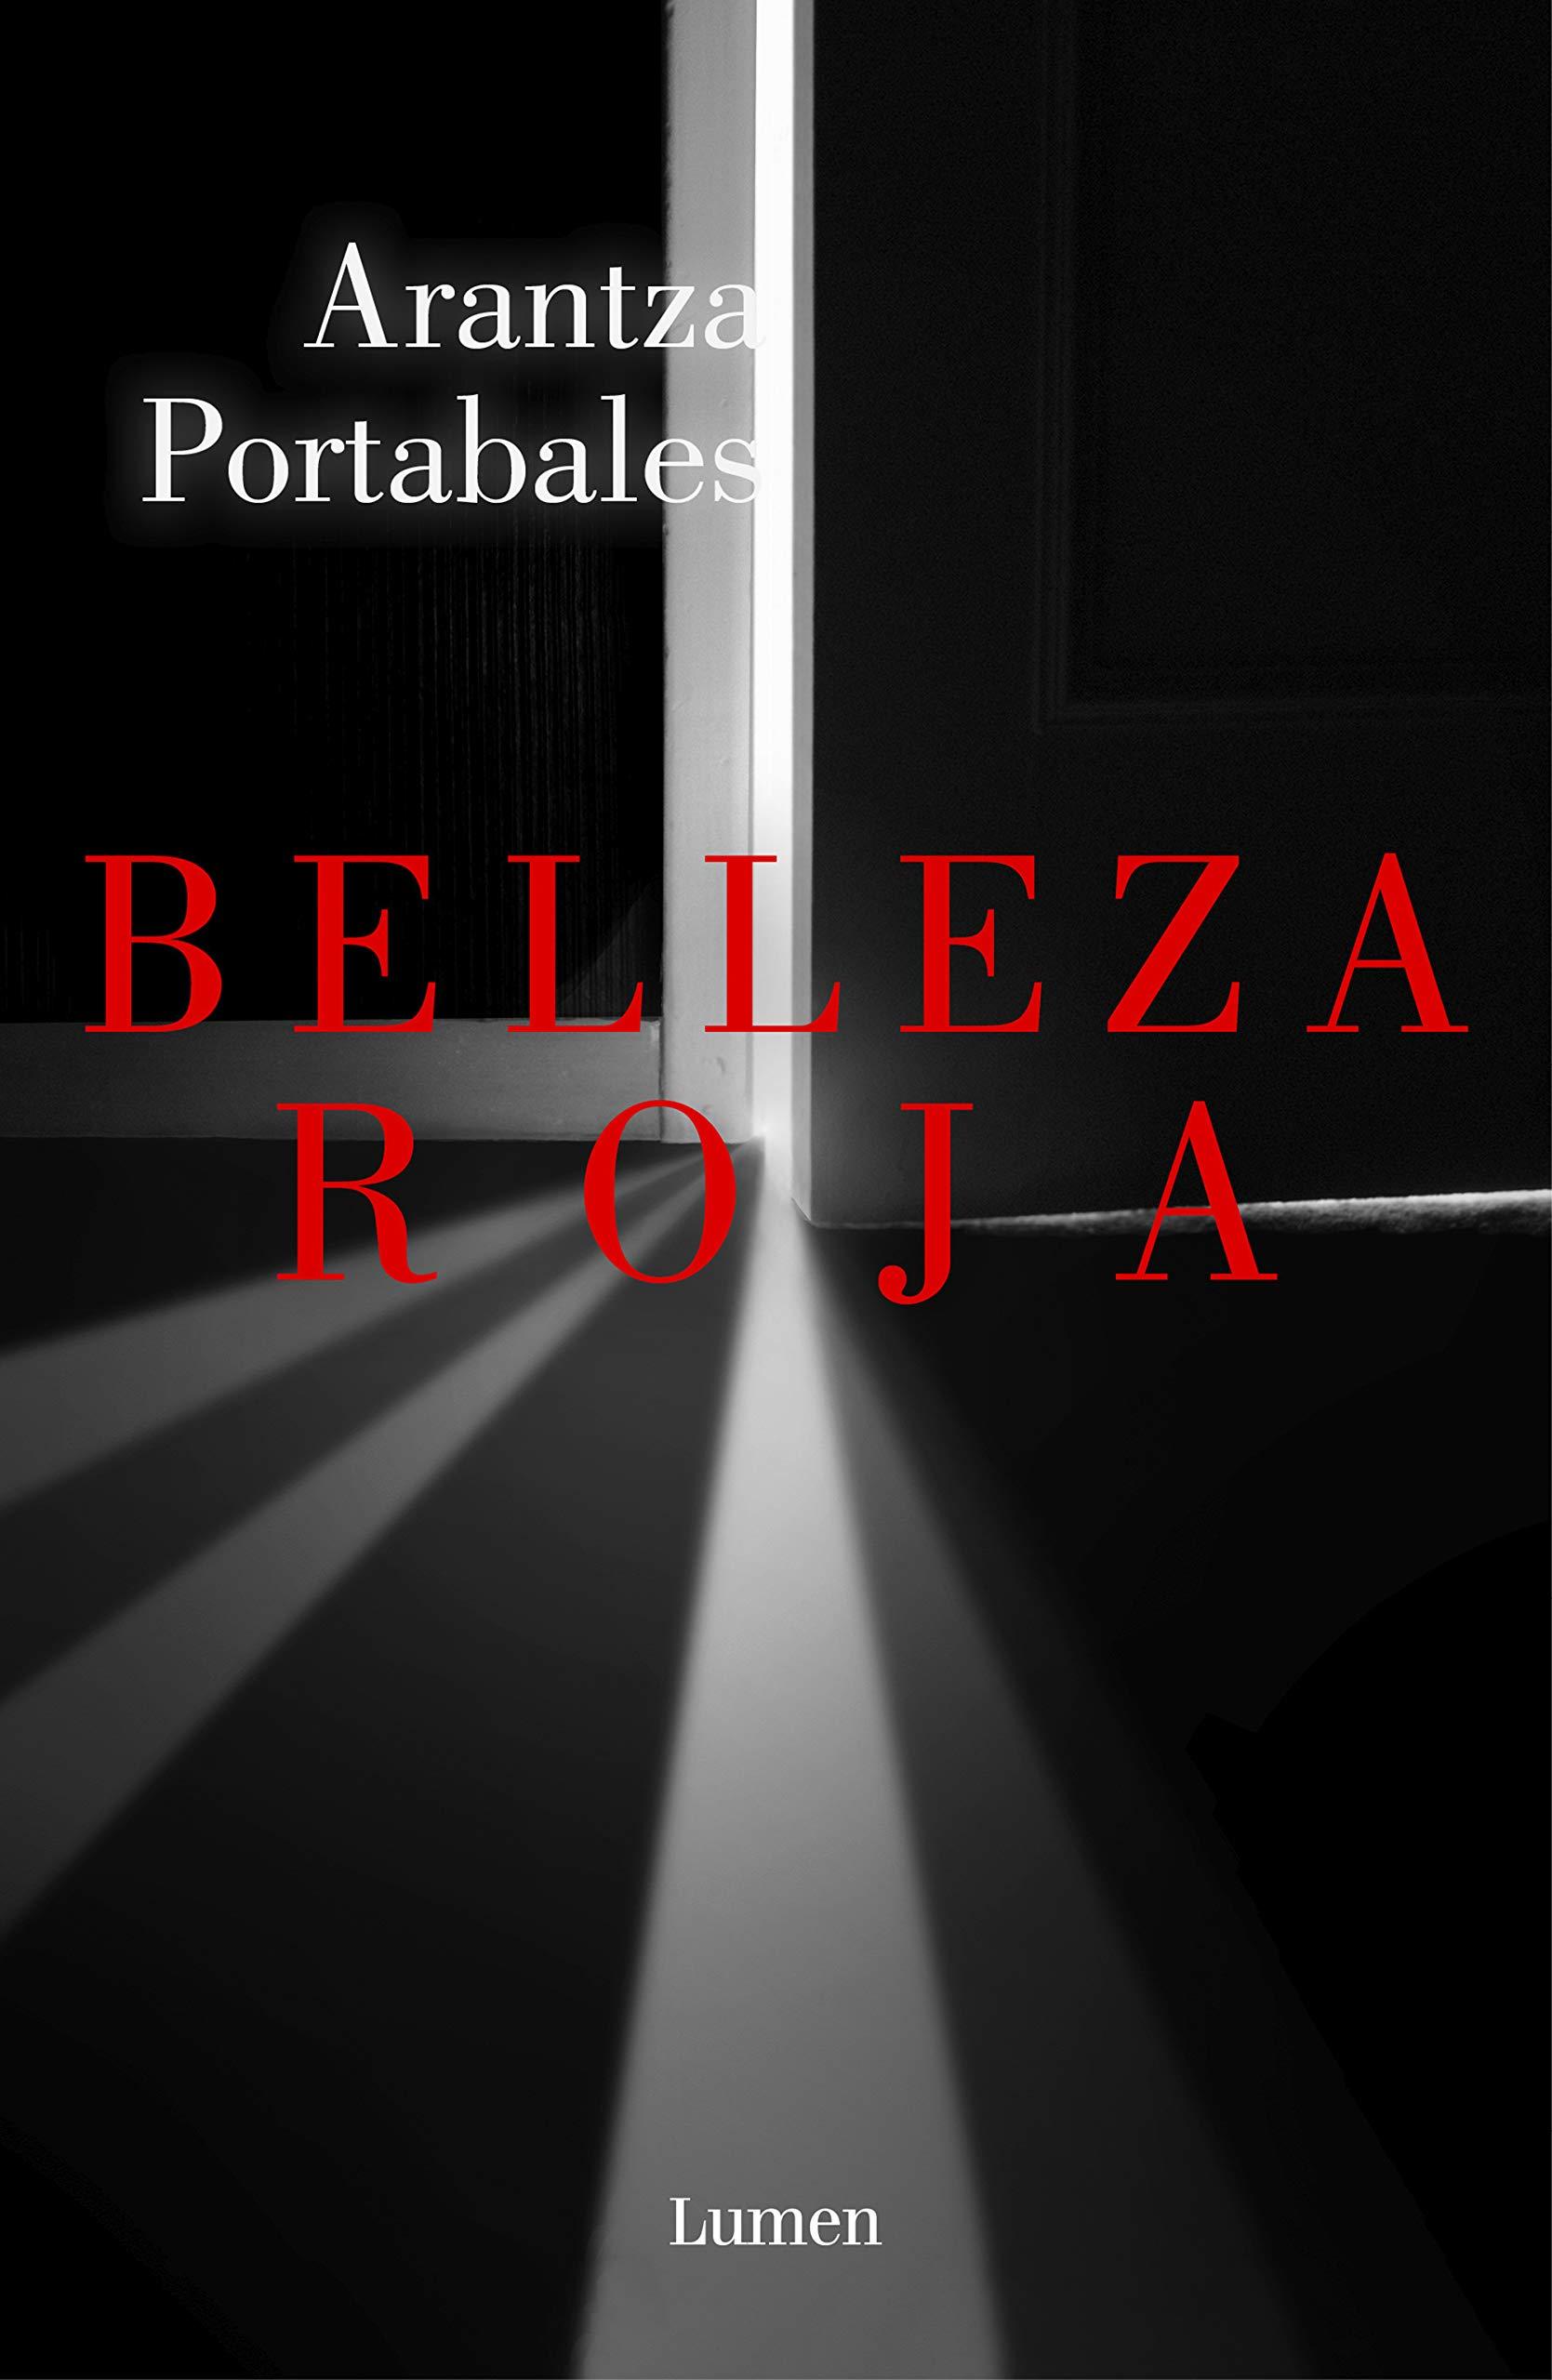 Belleza roja por Arantza Portabales